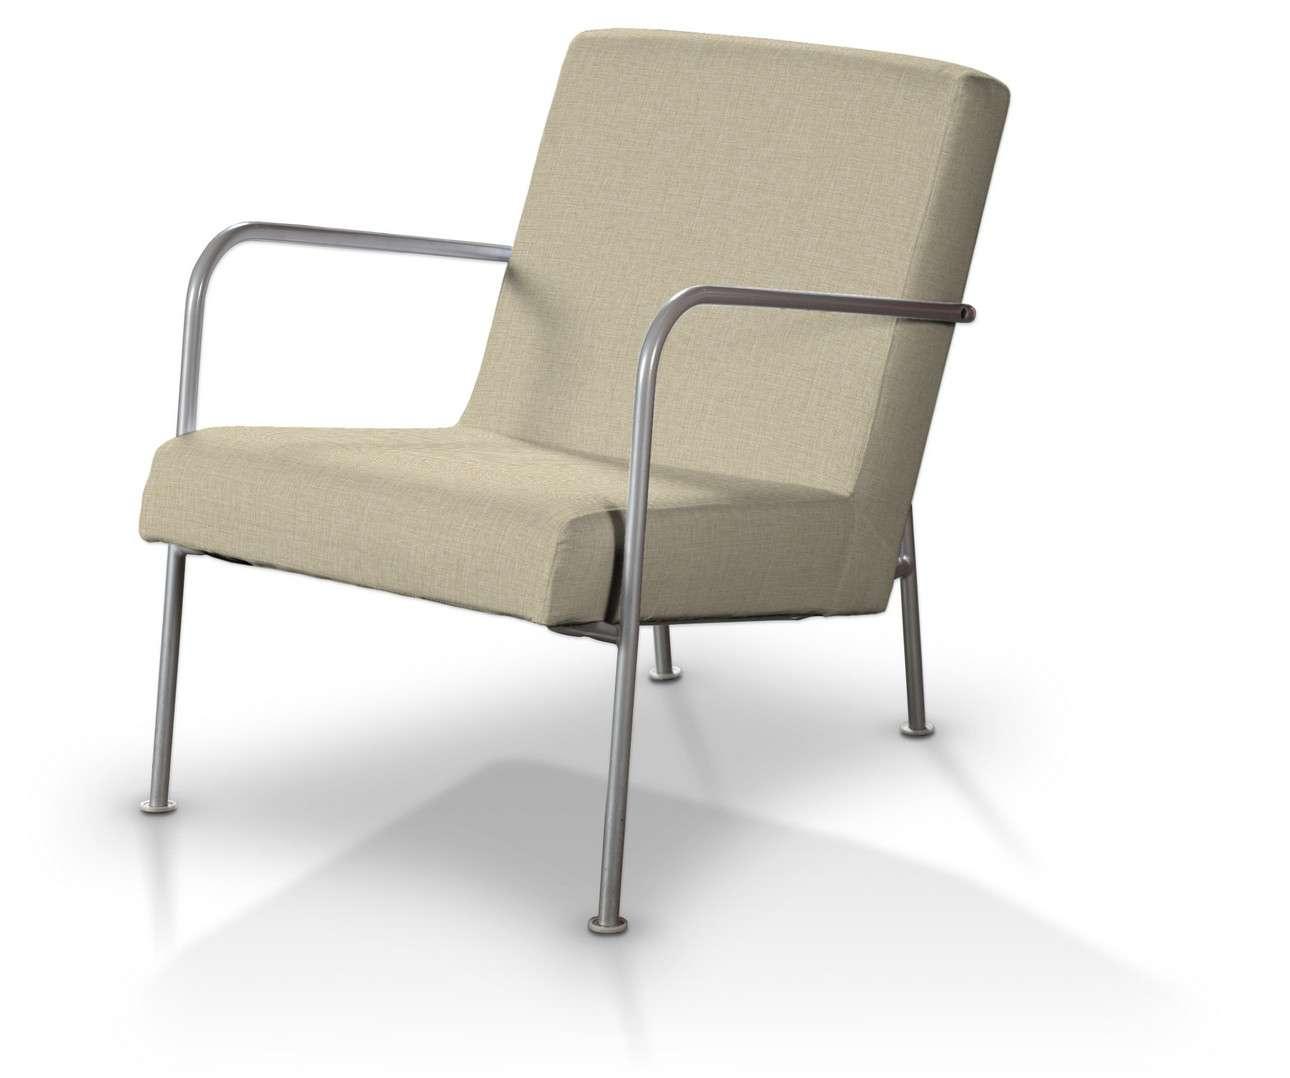 Potah na křeslo Ikea PS v kolekci Living, látka: 161-45